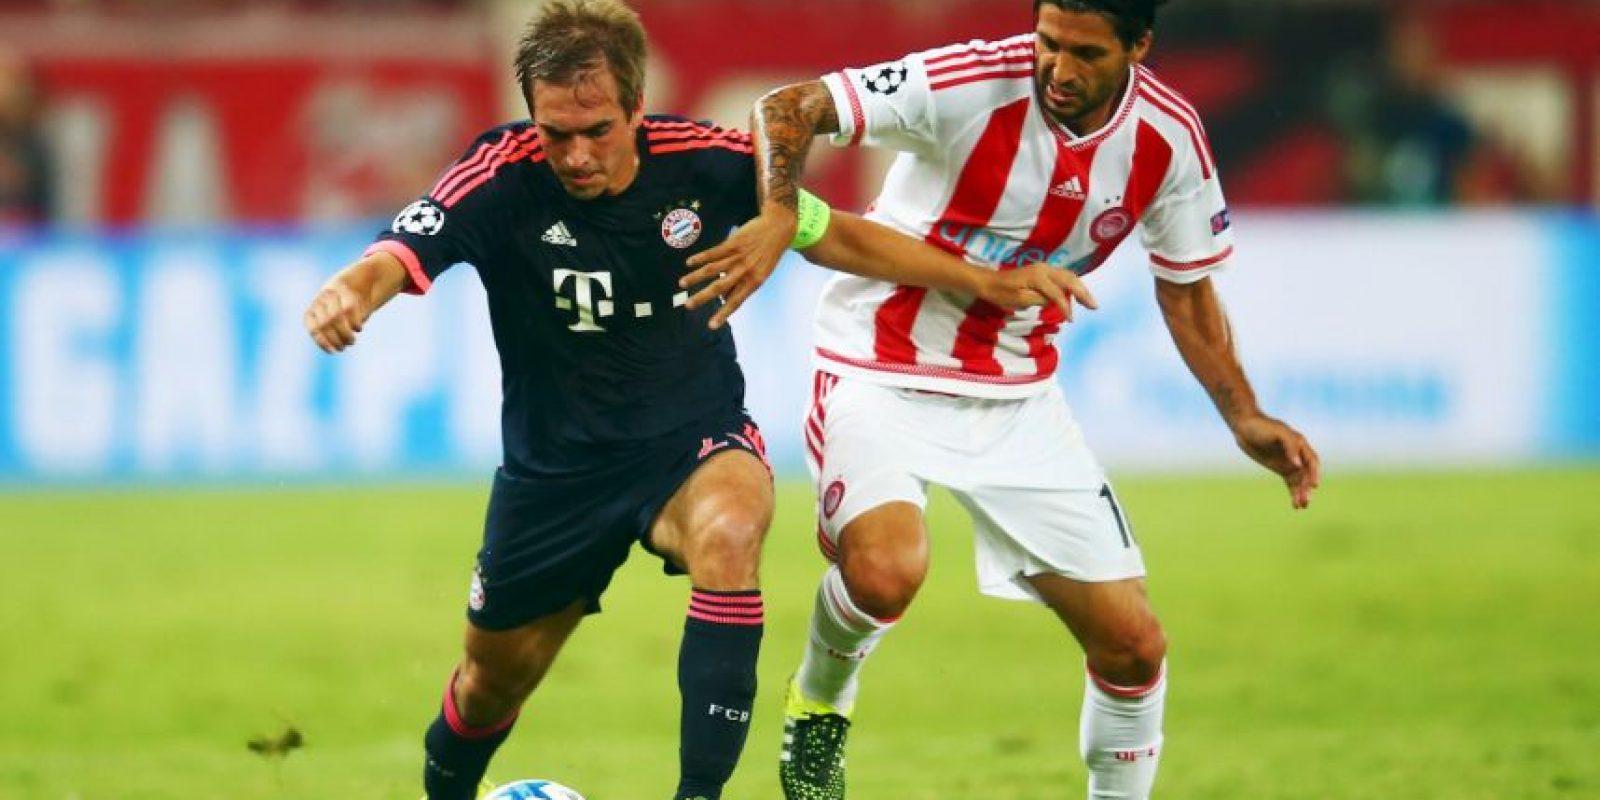 7. Bayern Múnich y Olympiakos se juegan la cima del Grupo F Foto:Getty Images